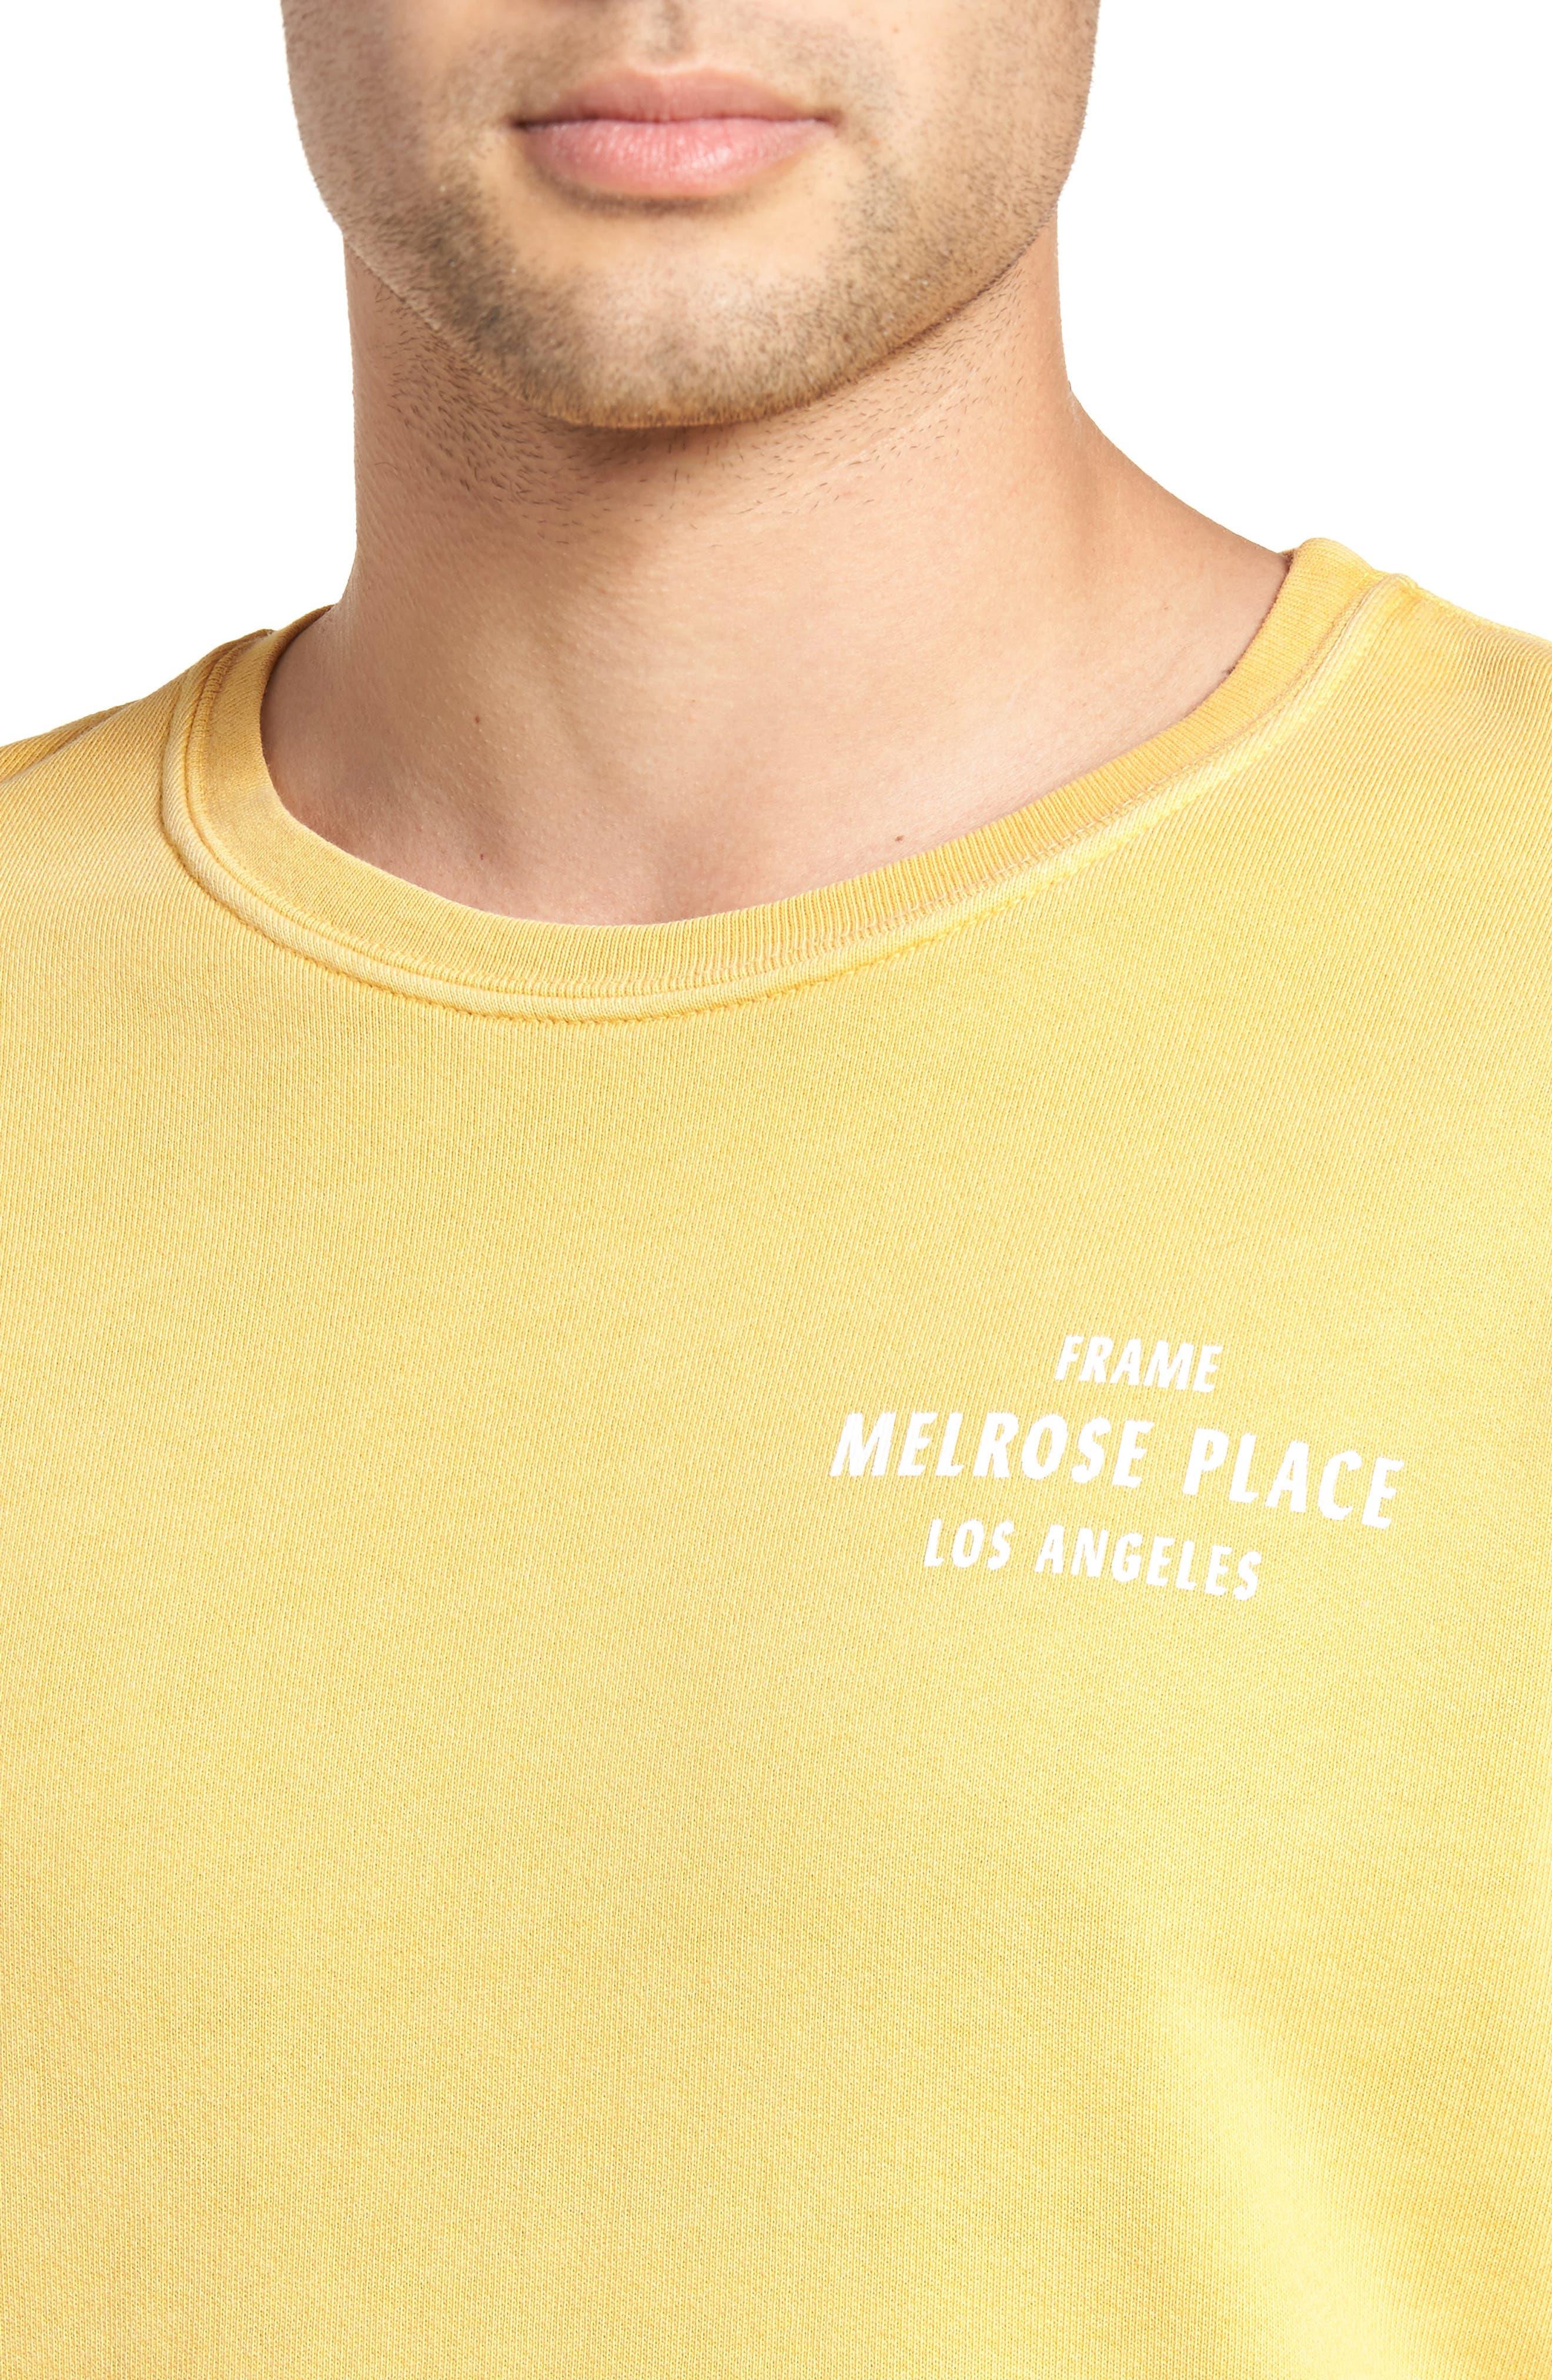 Vintage Crewneck Sweatshirt,                             Alternate thumbnail 12, color,